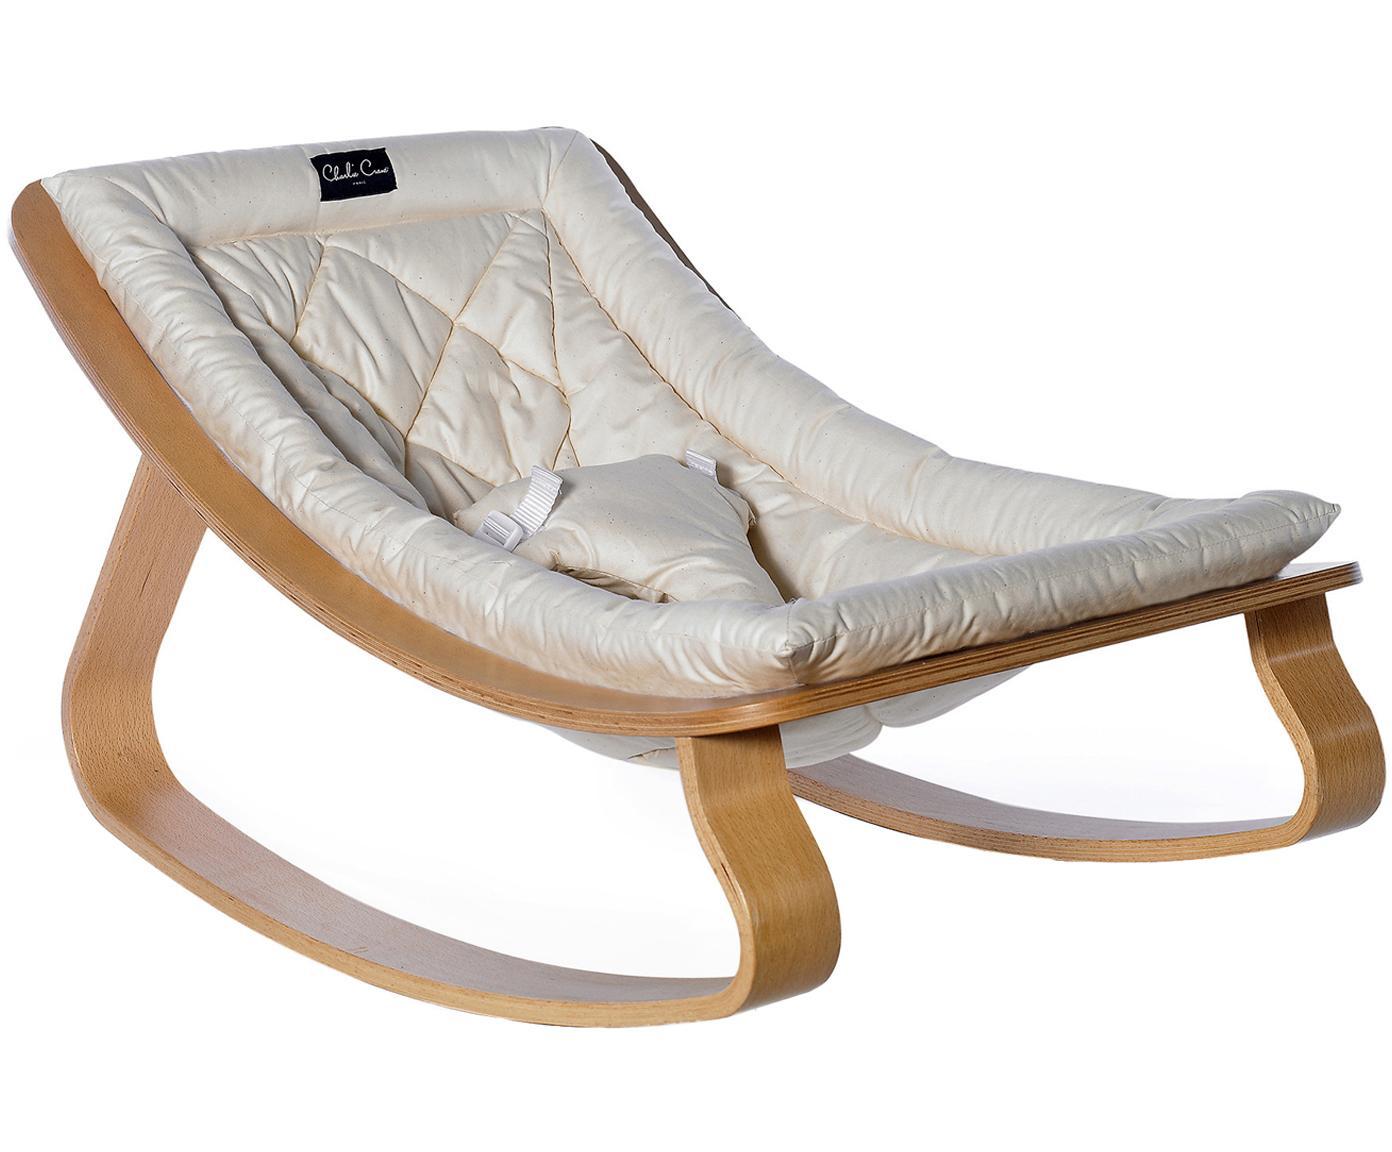 Hamaca bebé Levo, Patas: madera de abedul, madera , Funda: algodón, Beige, blanco, An 70 x Al 40 cm